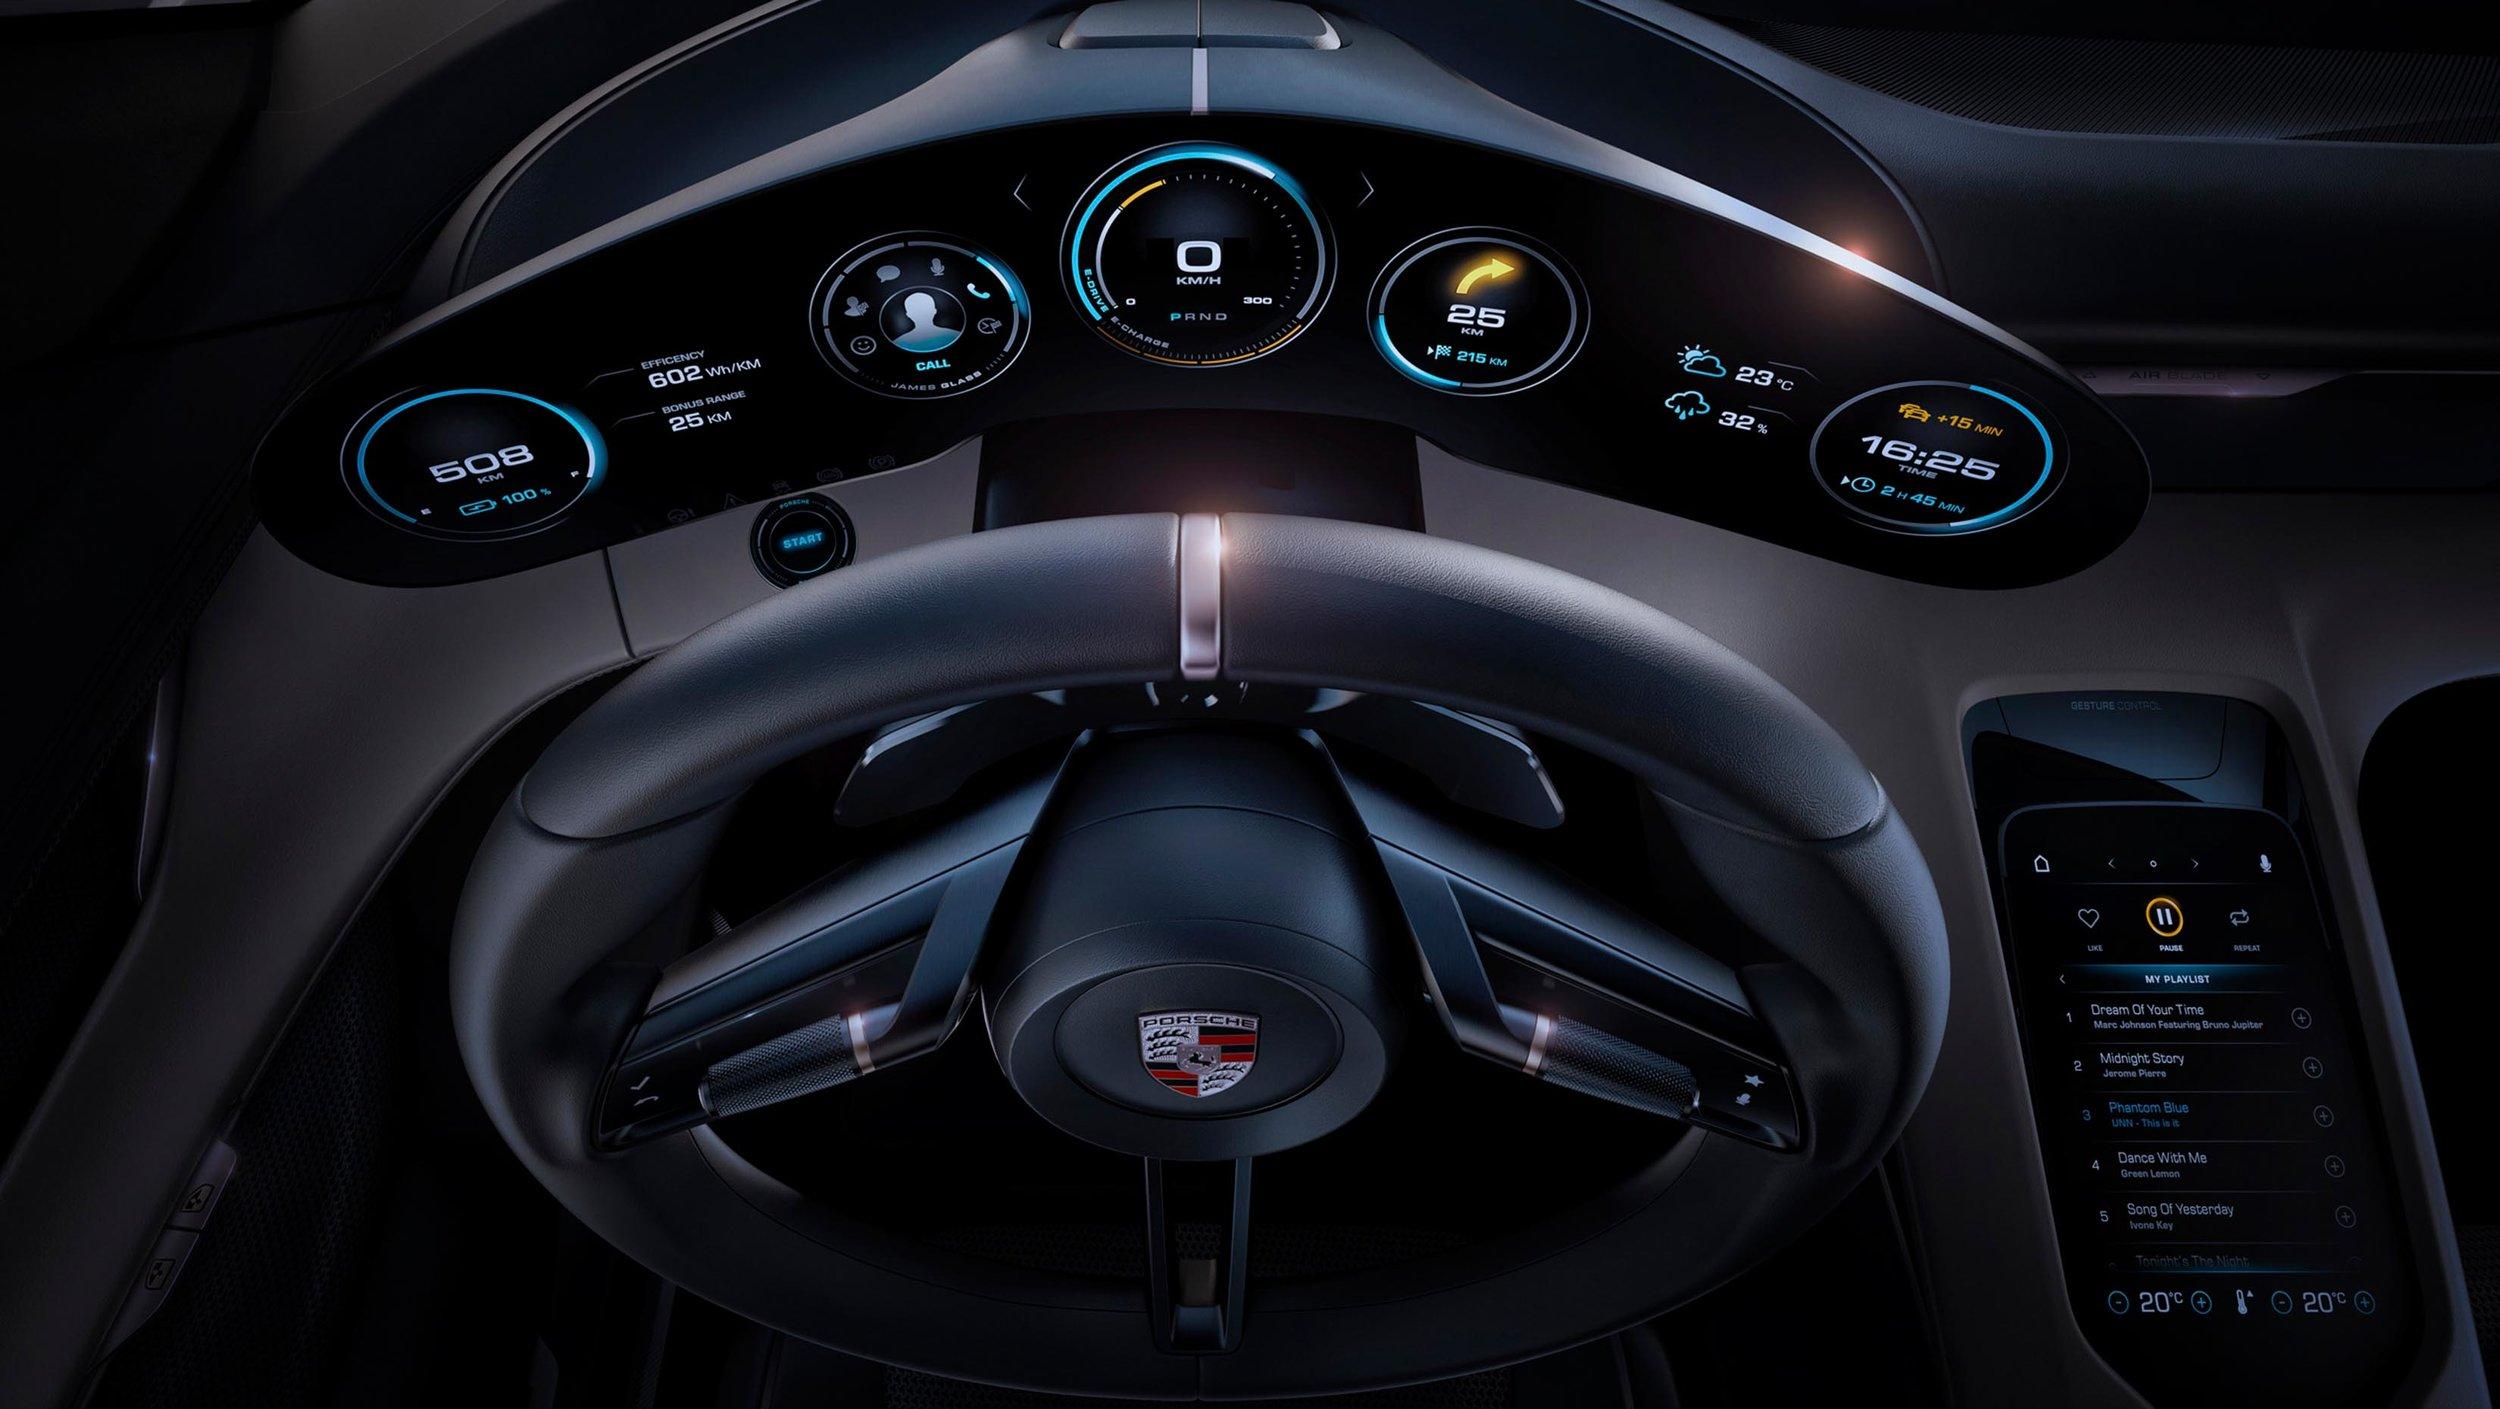 high_mission_e_concept_car_2015_porsche_ag(3).jpg